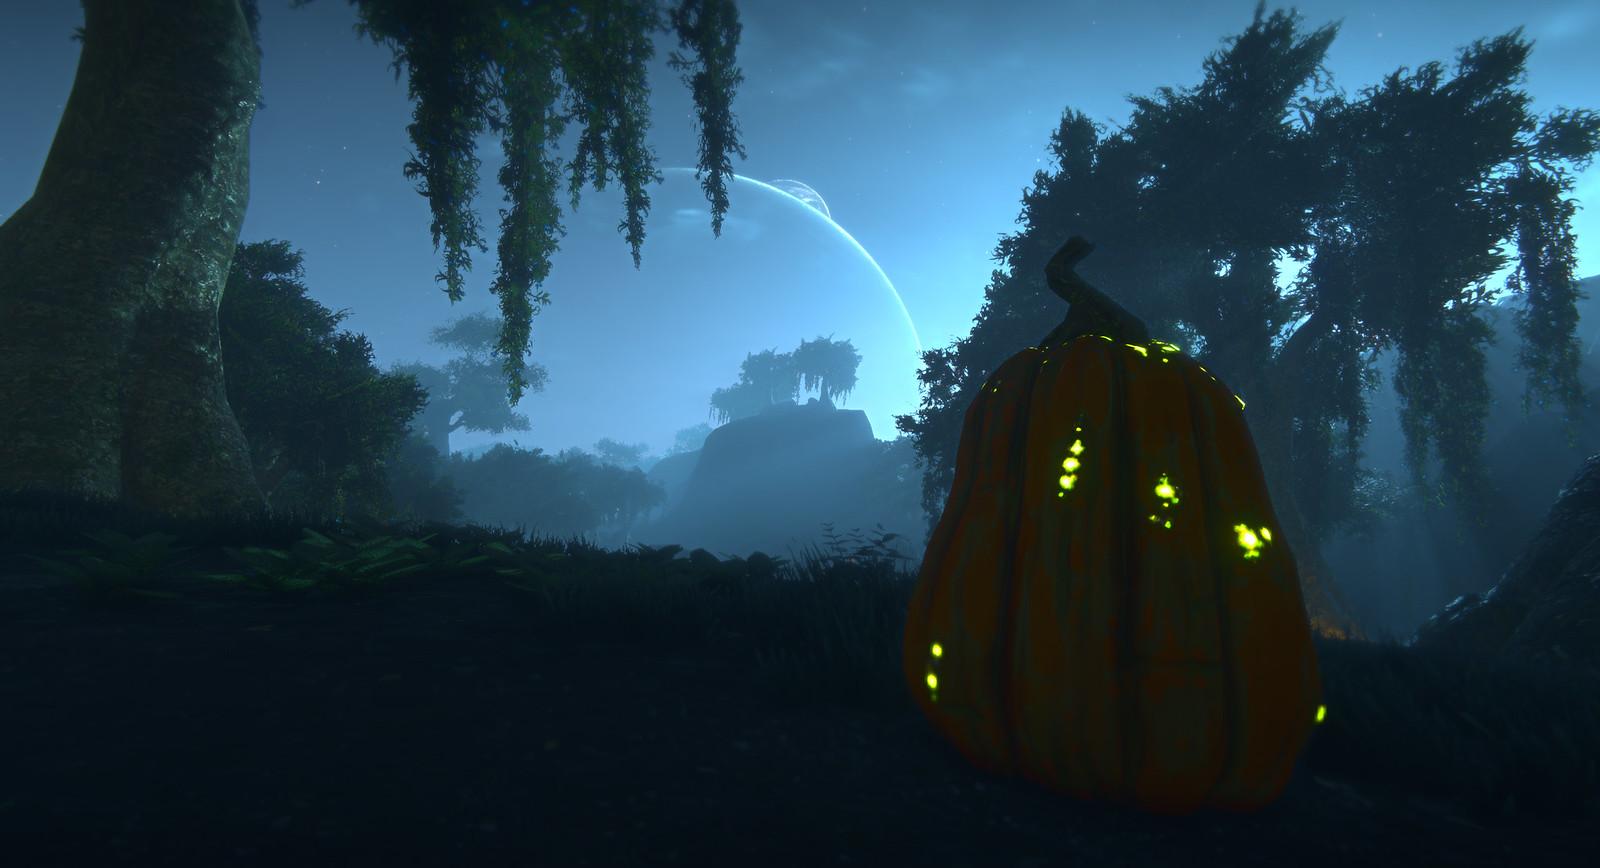 HalloweenHeaderScreenshot1